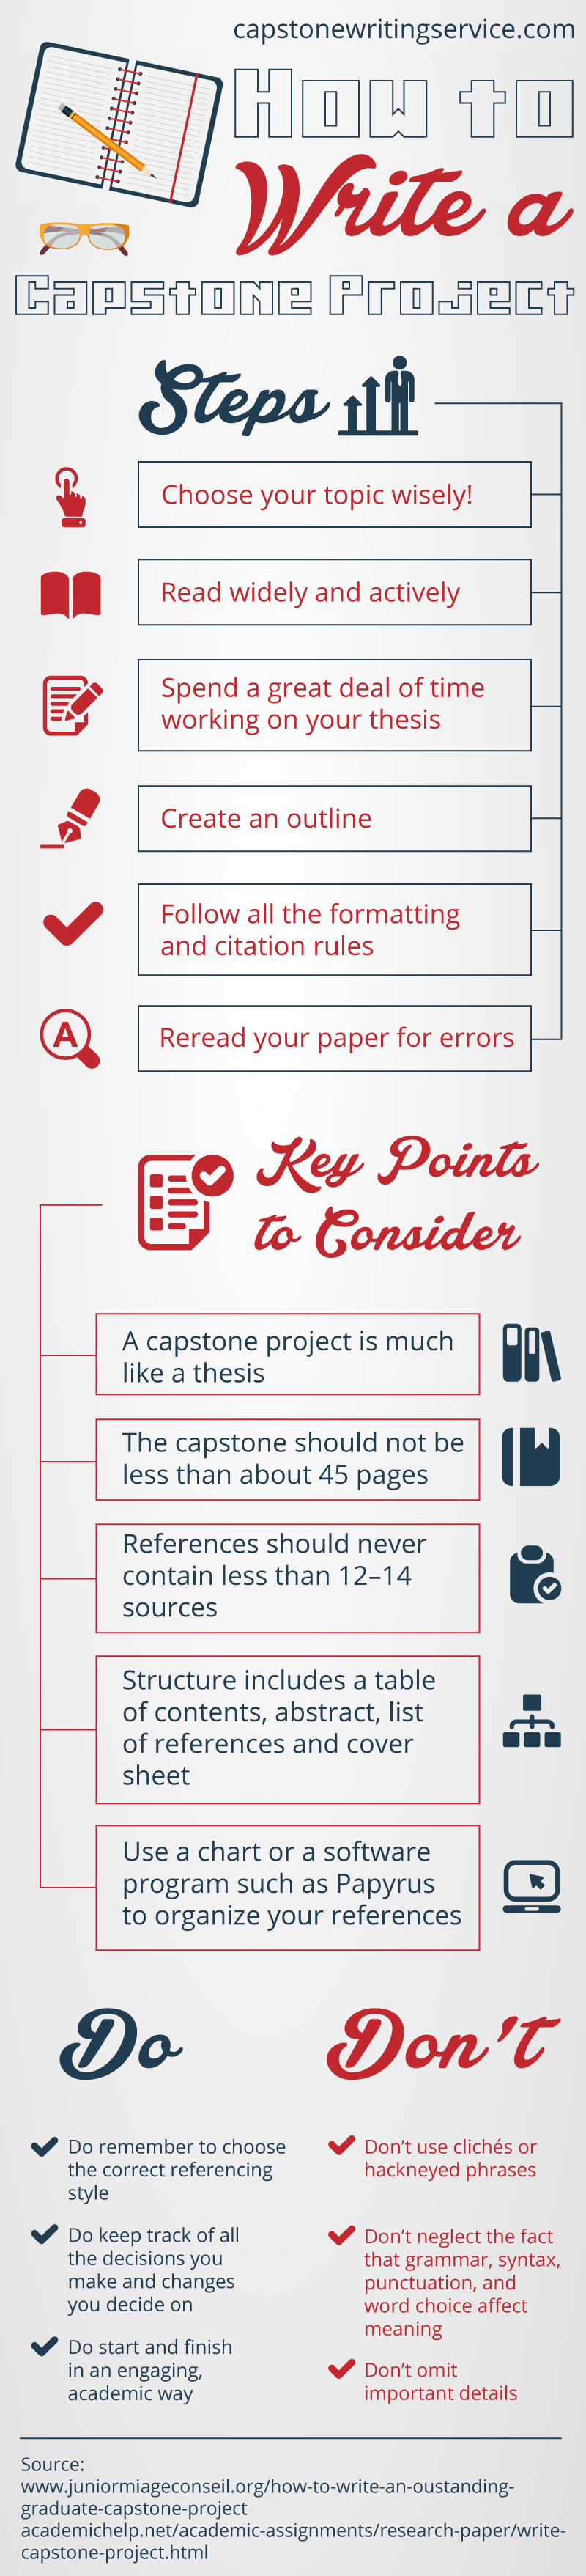 How to write a capstone paper outline